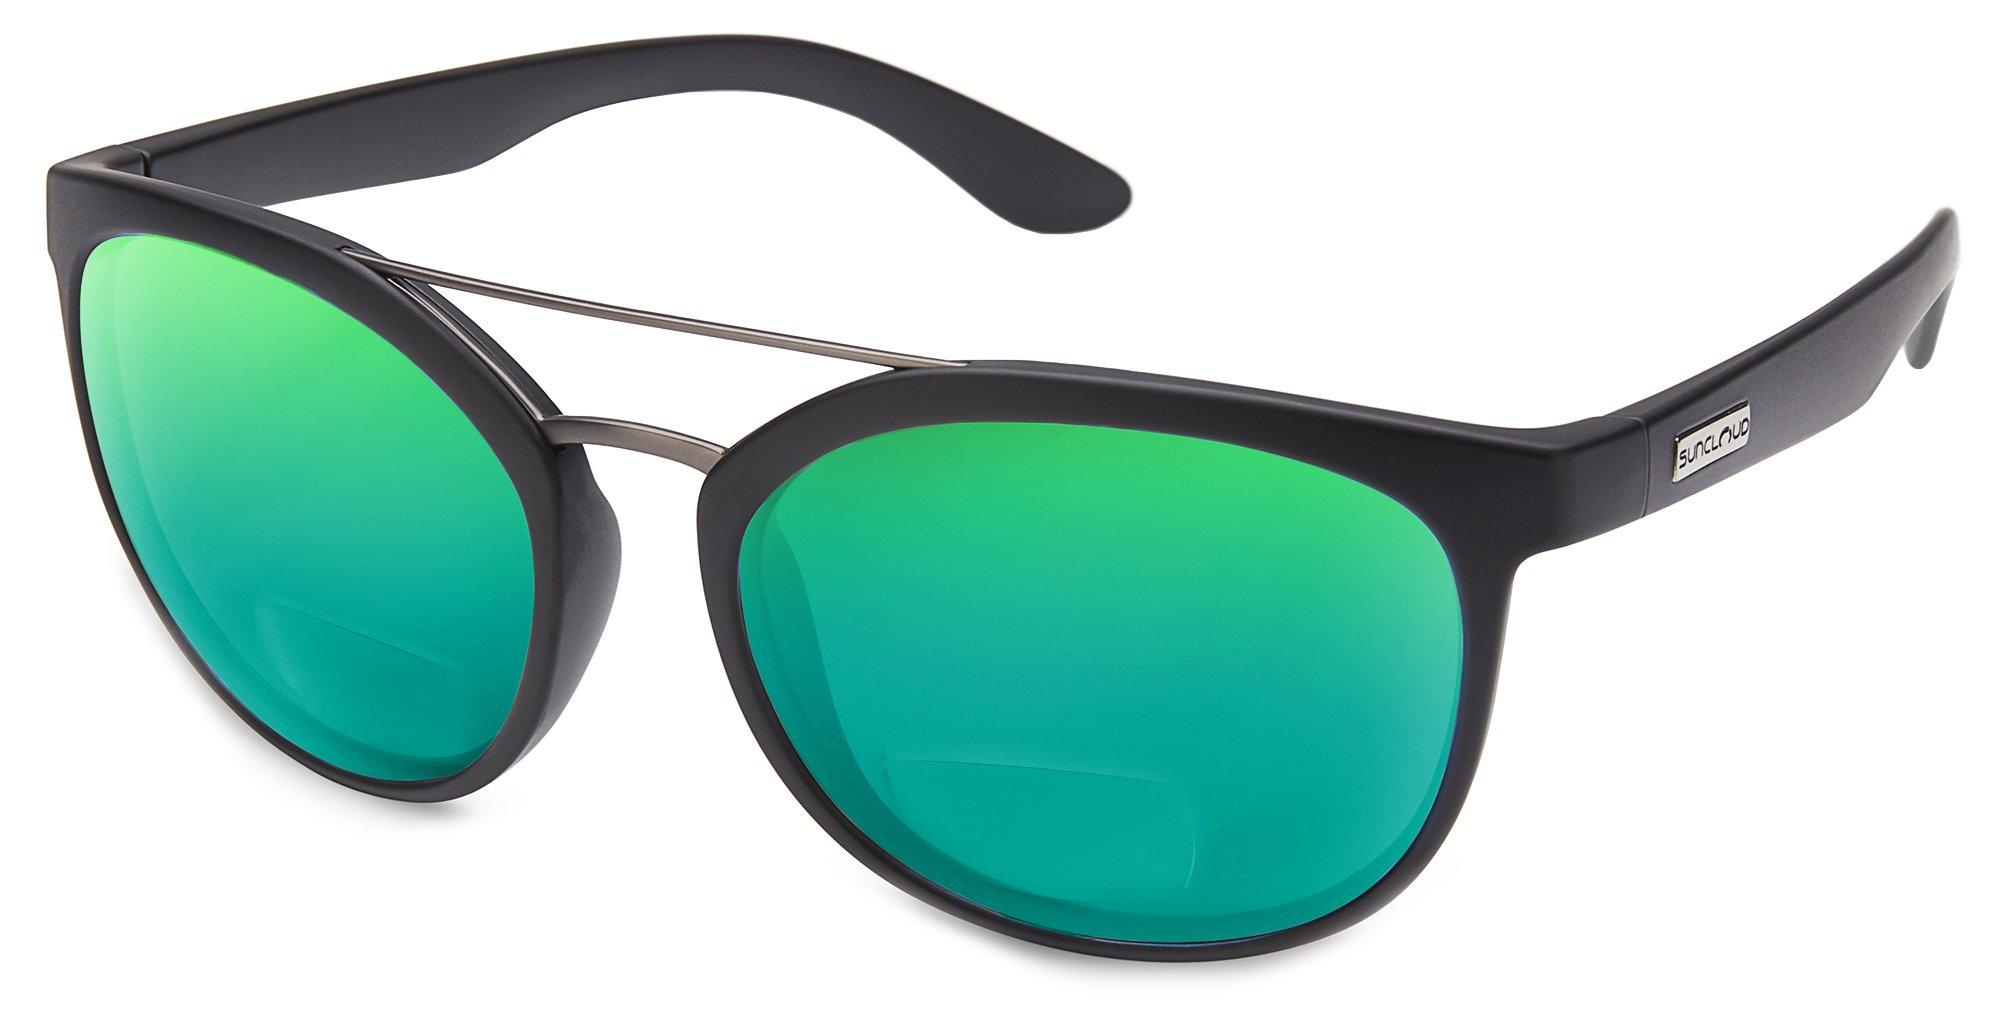 2b8f54151b1 Suncloud Liberty Polarized Bi-Focal Reading Sunglasses in Matte Black with  Green Mirror Lens +2.75